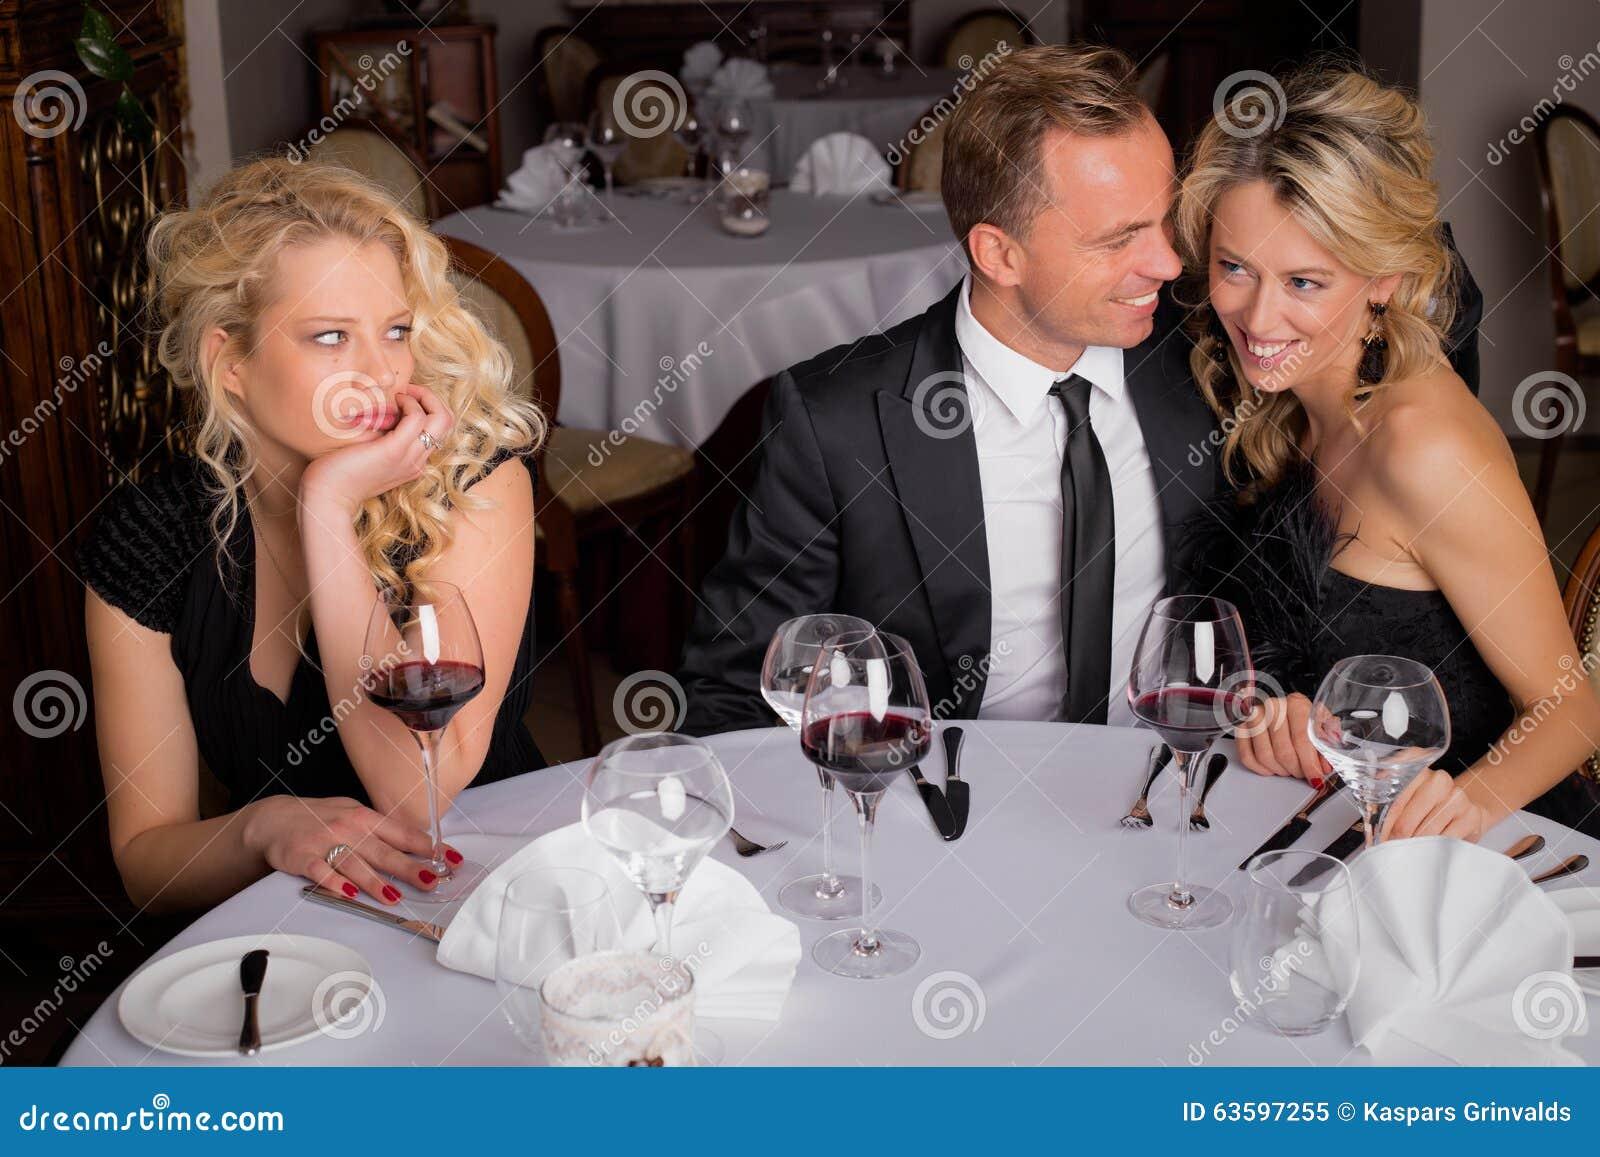 Threesome Dinner